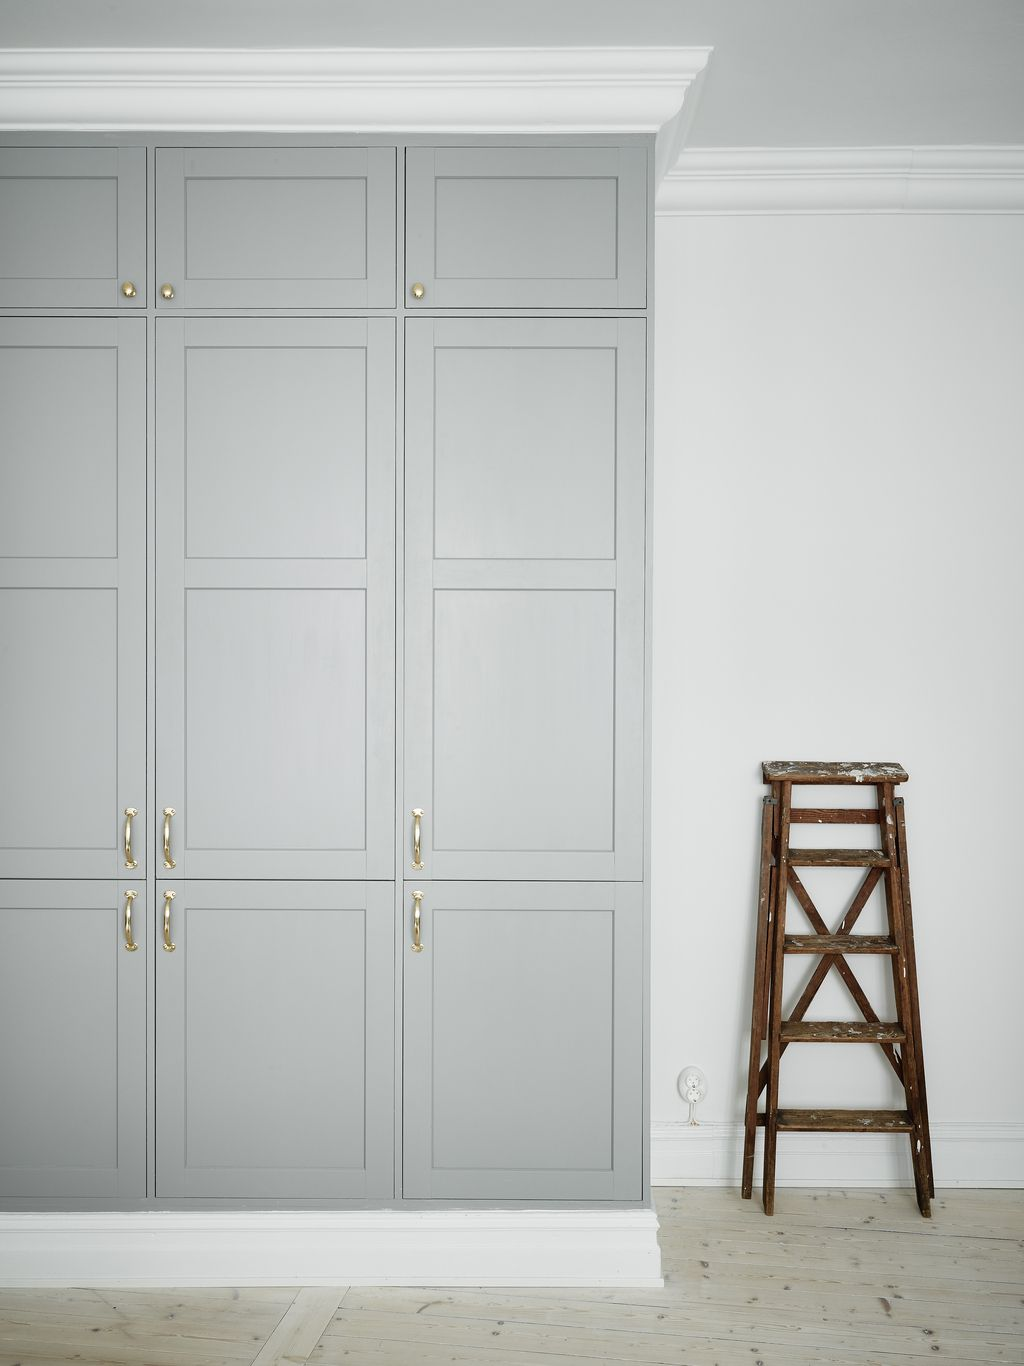 Hallway storage cabinet  Built in wardrobe  STORAGE  Pinterest  Wardrobes Bedrooms and